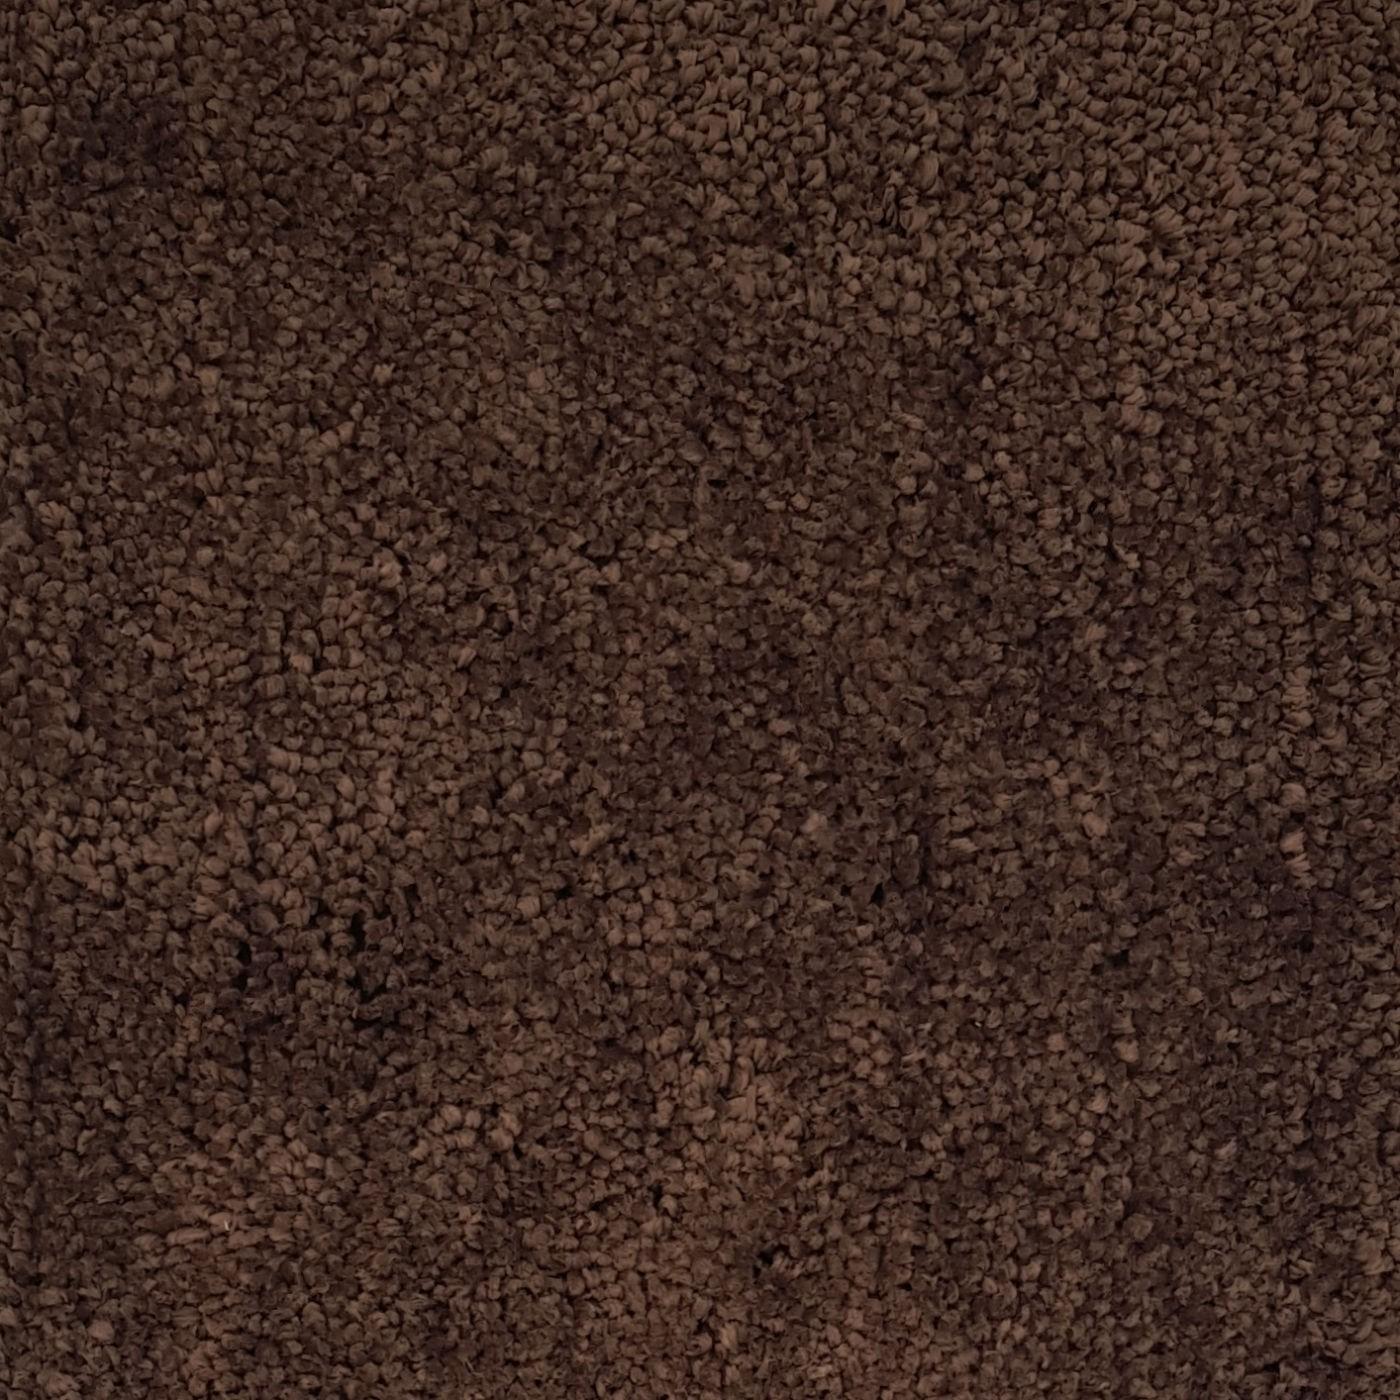 Covor living / dormitor Wuhan Chip microfibra 01 poliester dreptunghiular maro 80 x 150 cm